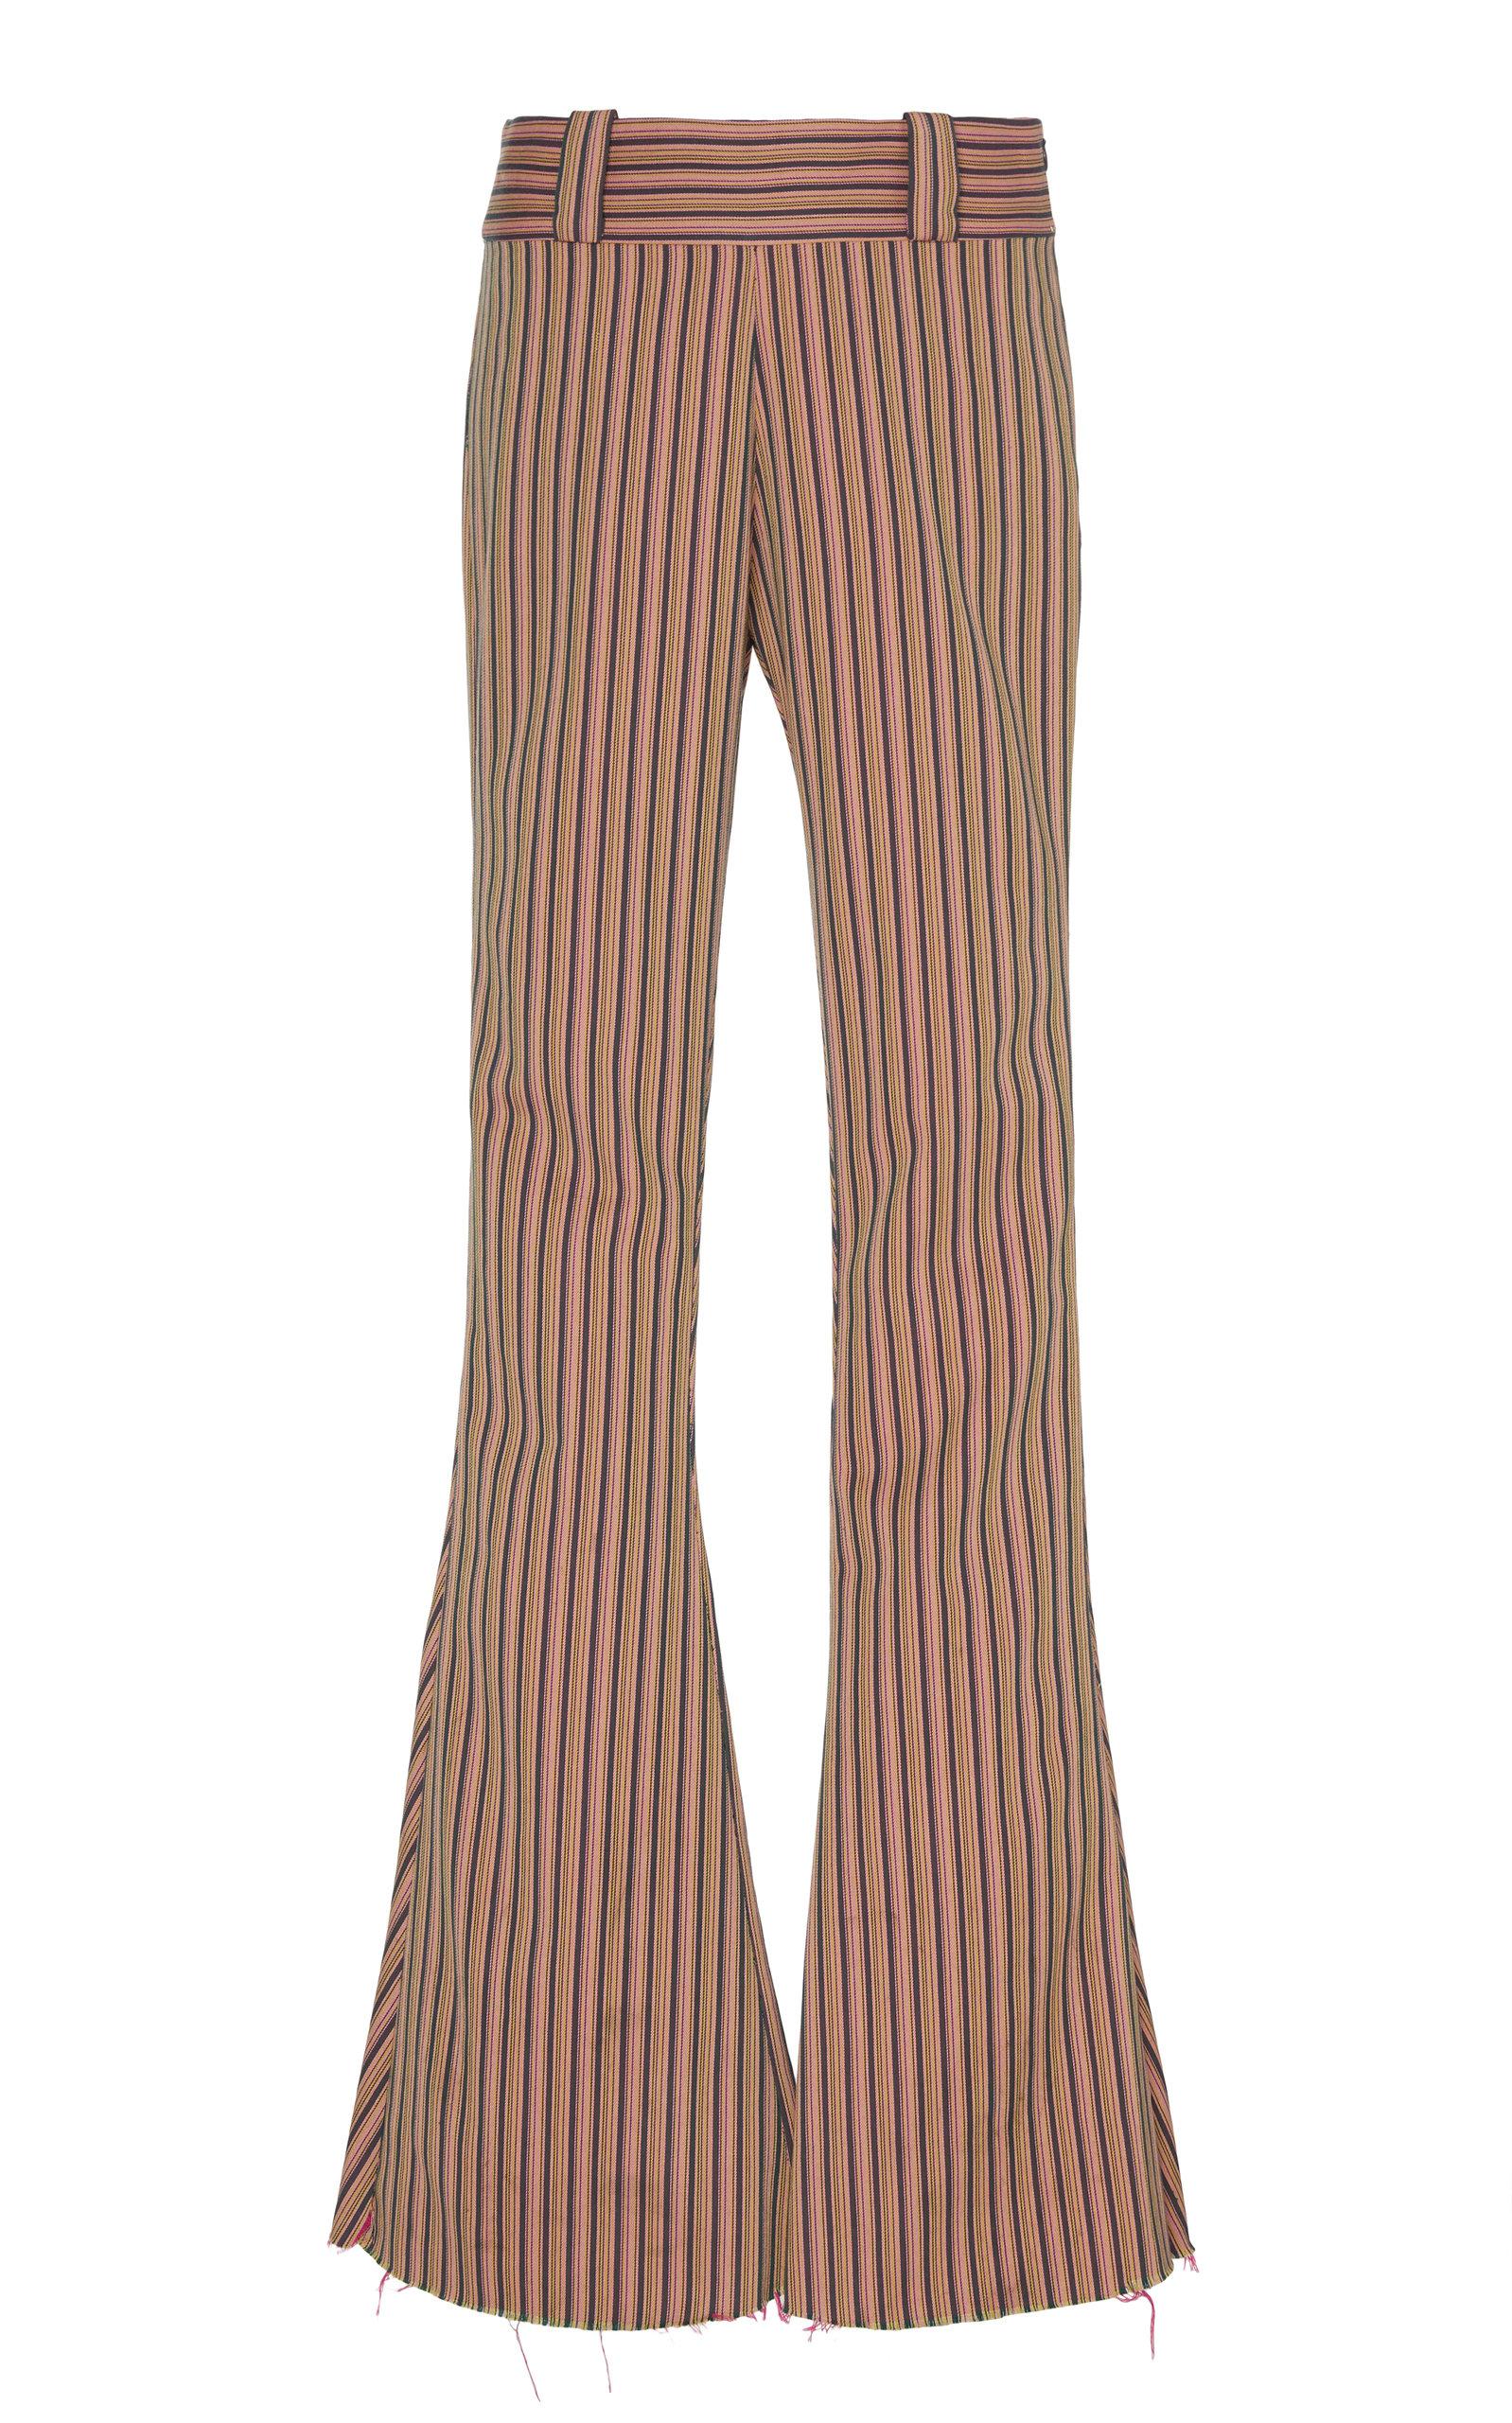 Alix of Bohemia - Women's Carnaby Striped Cotton Flared Pants  - Purple - Moda Operandi